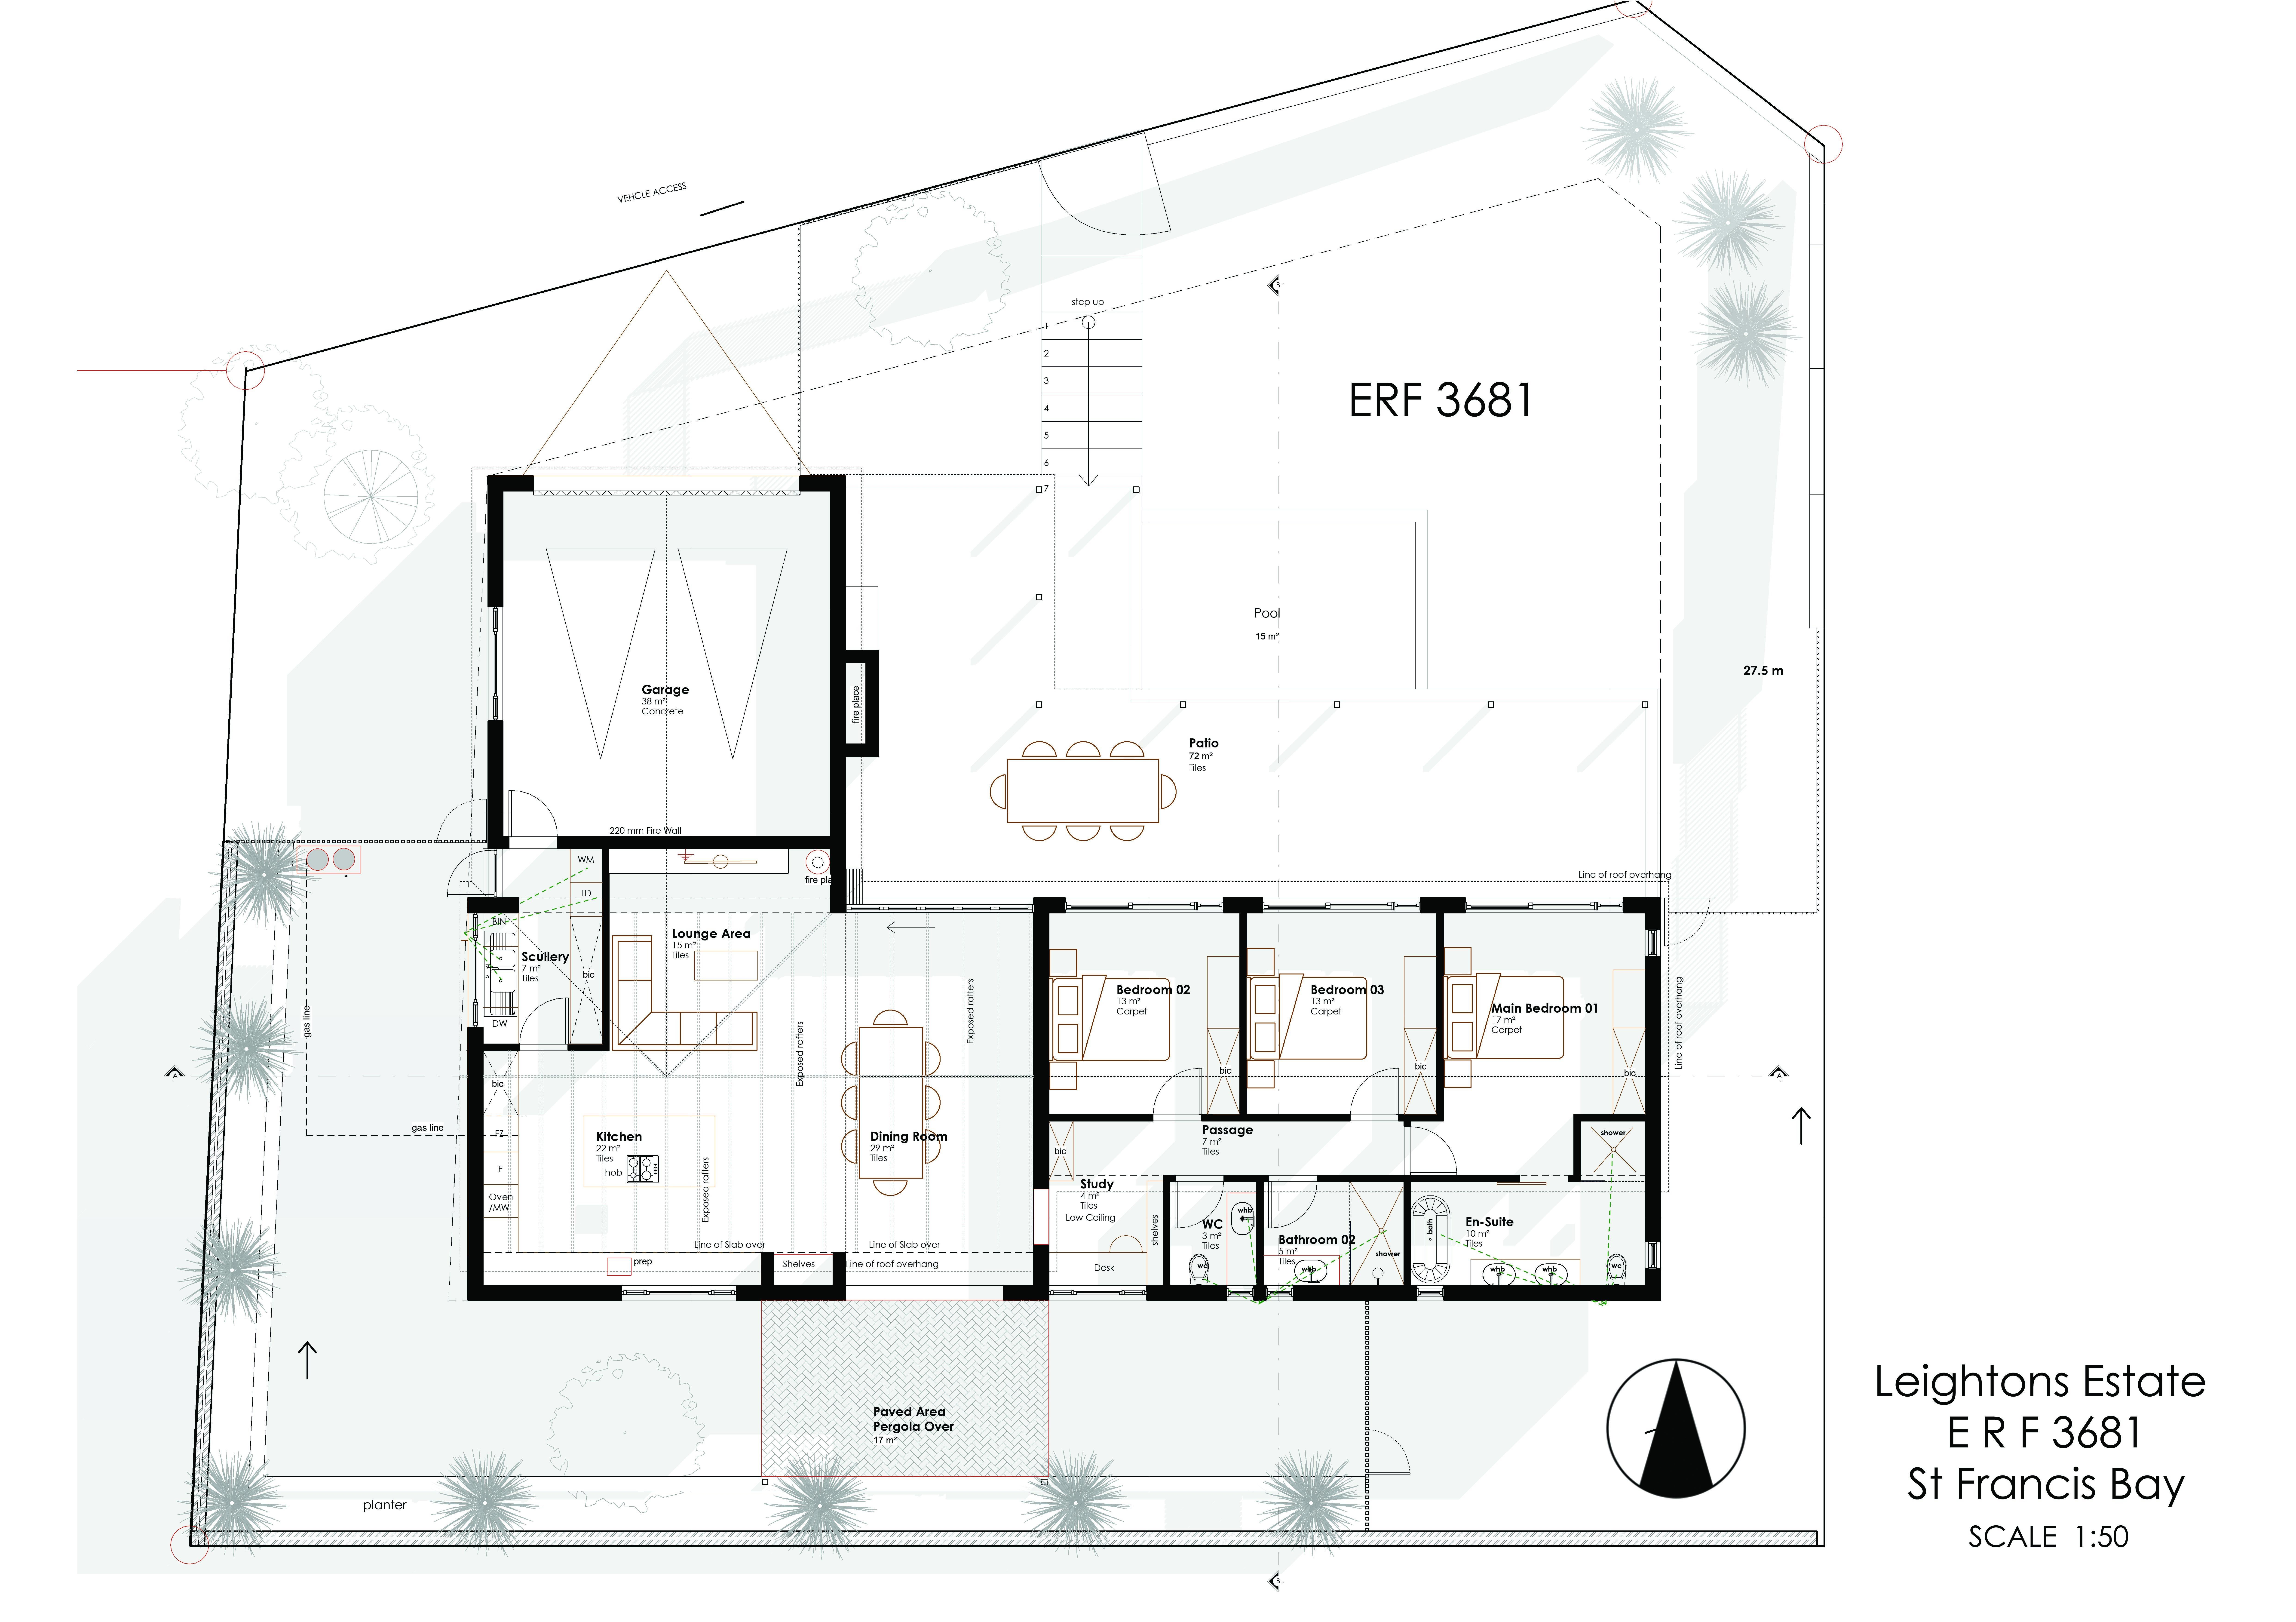 Leighton's Estate – 3 Bedroom New Build